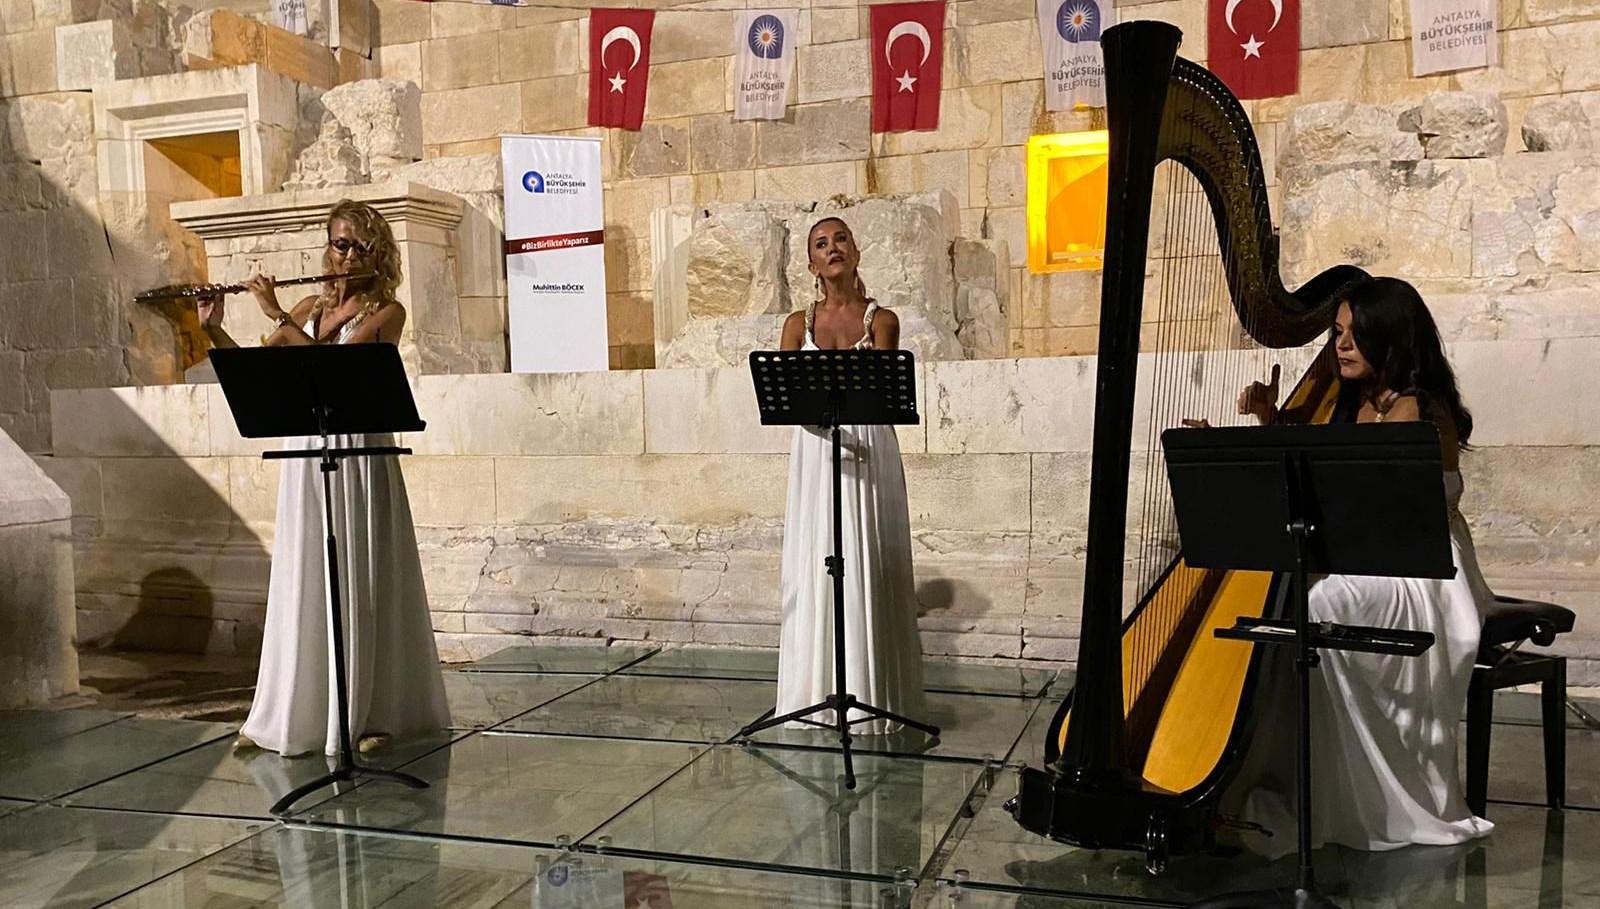 Trio Patara Grubu ilk konserini Patara'daki meclis binasında verdi